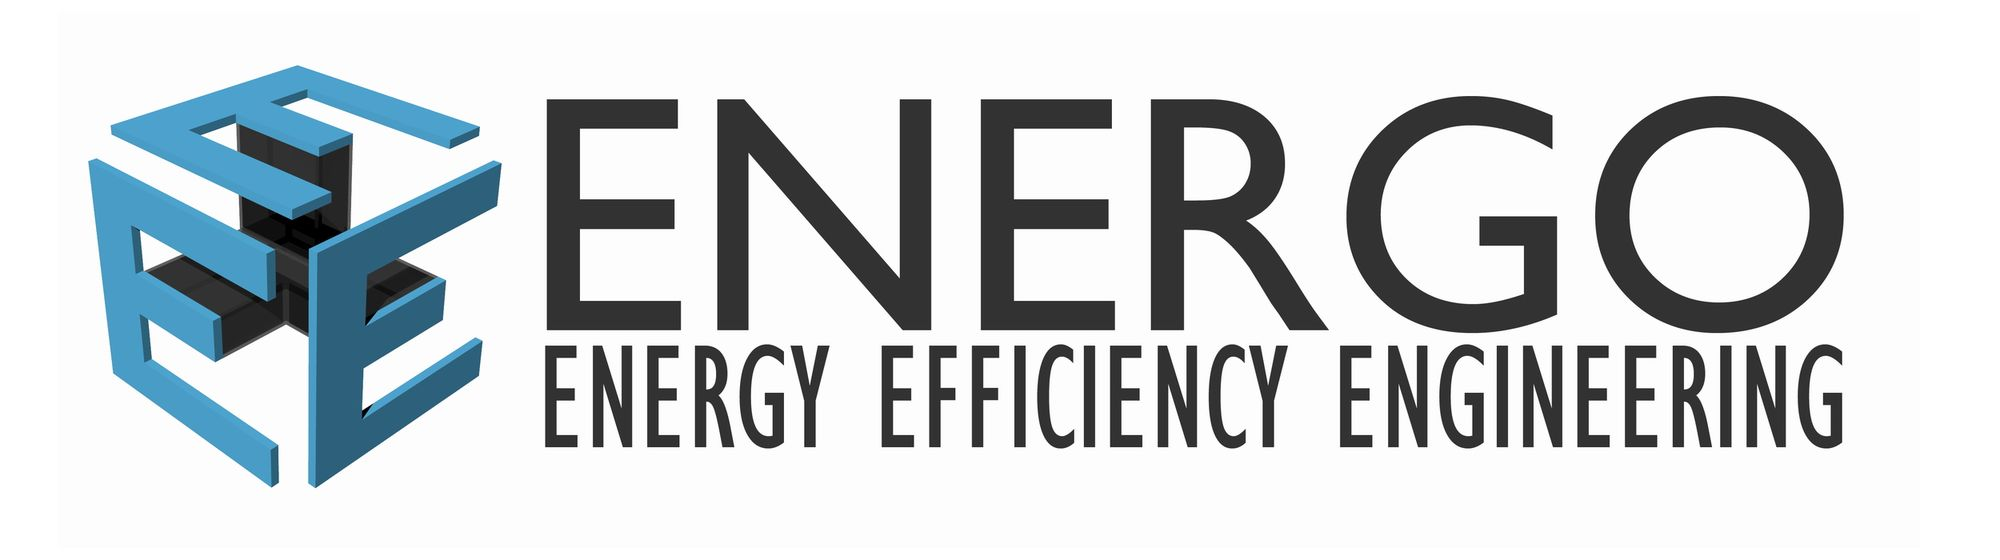 Energo energy efficiency engineering d.o.o.